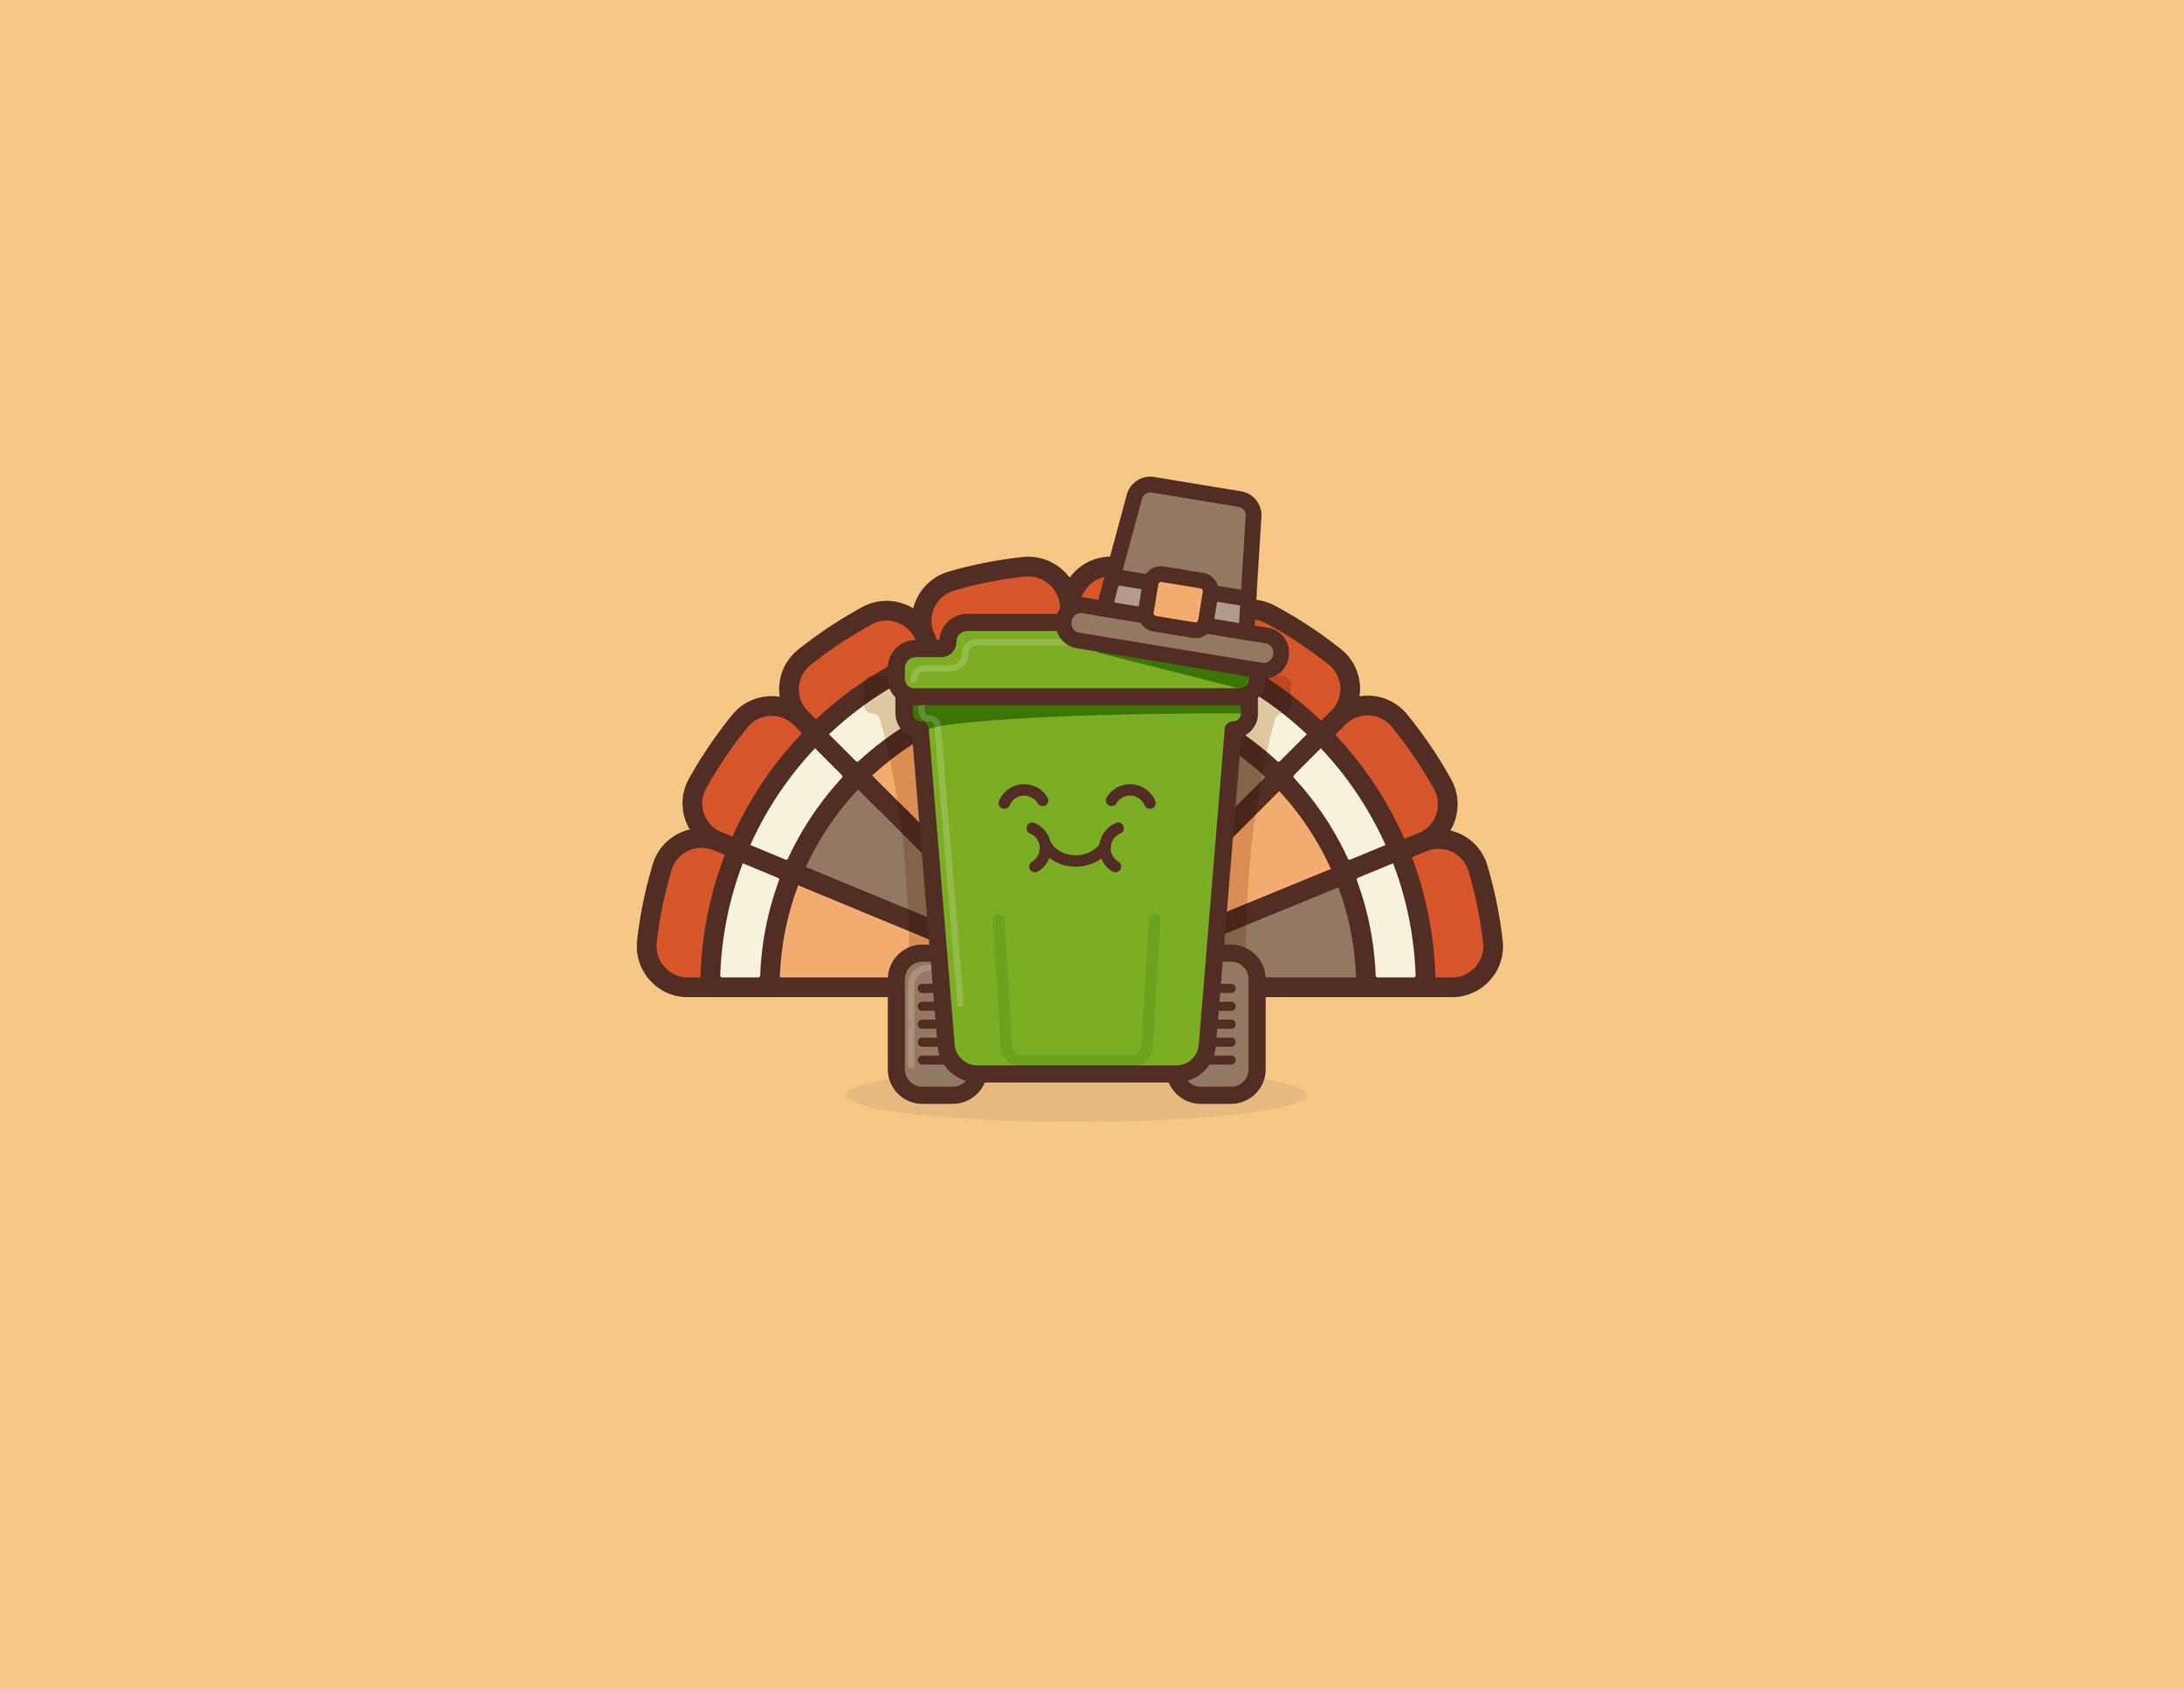 MESCHIERI_ADDY_2018_SCRAPPY_82_ILLUSTRATION_thanksgiving.jpg